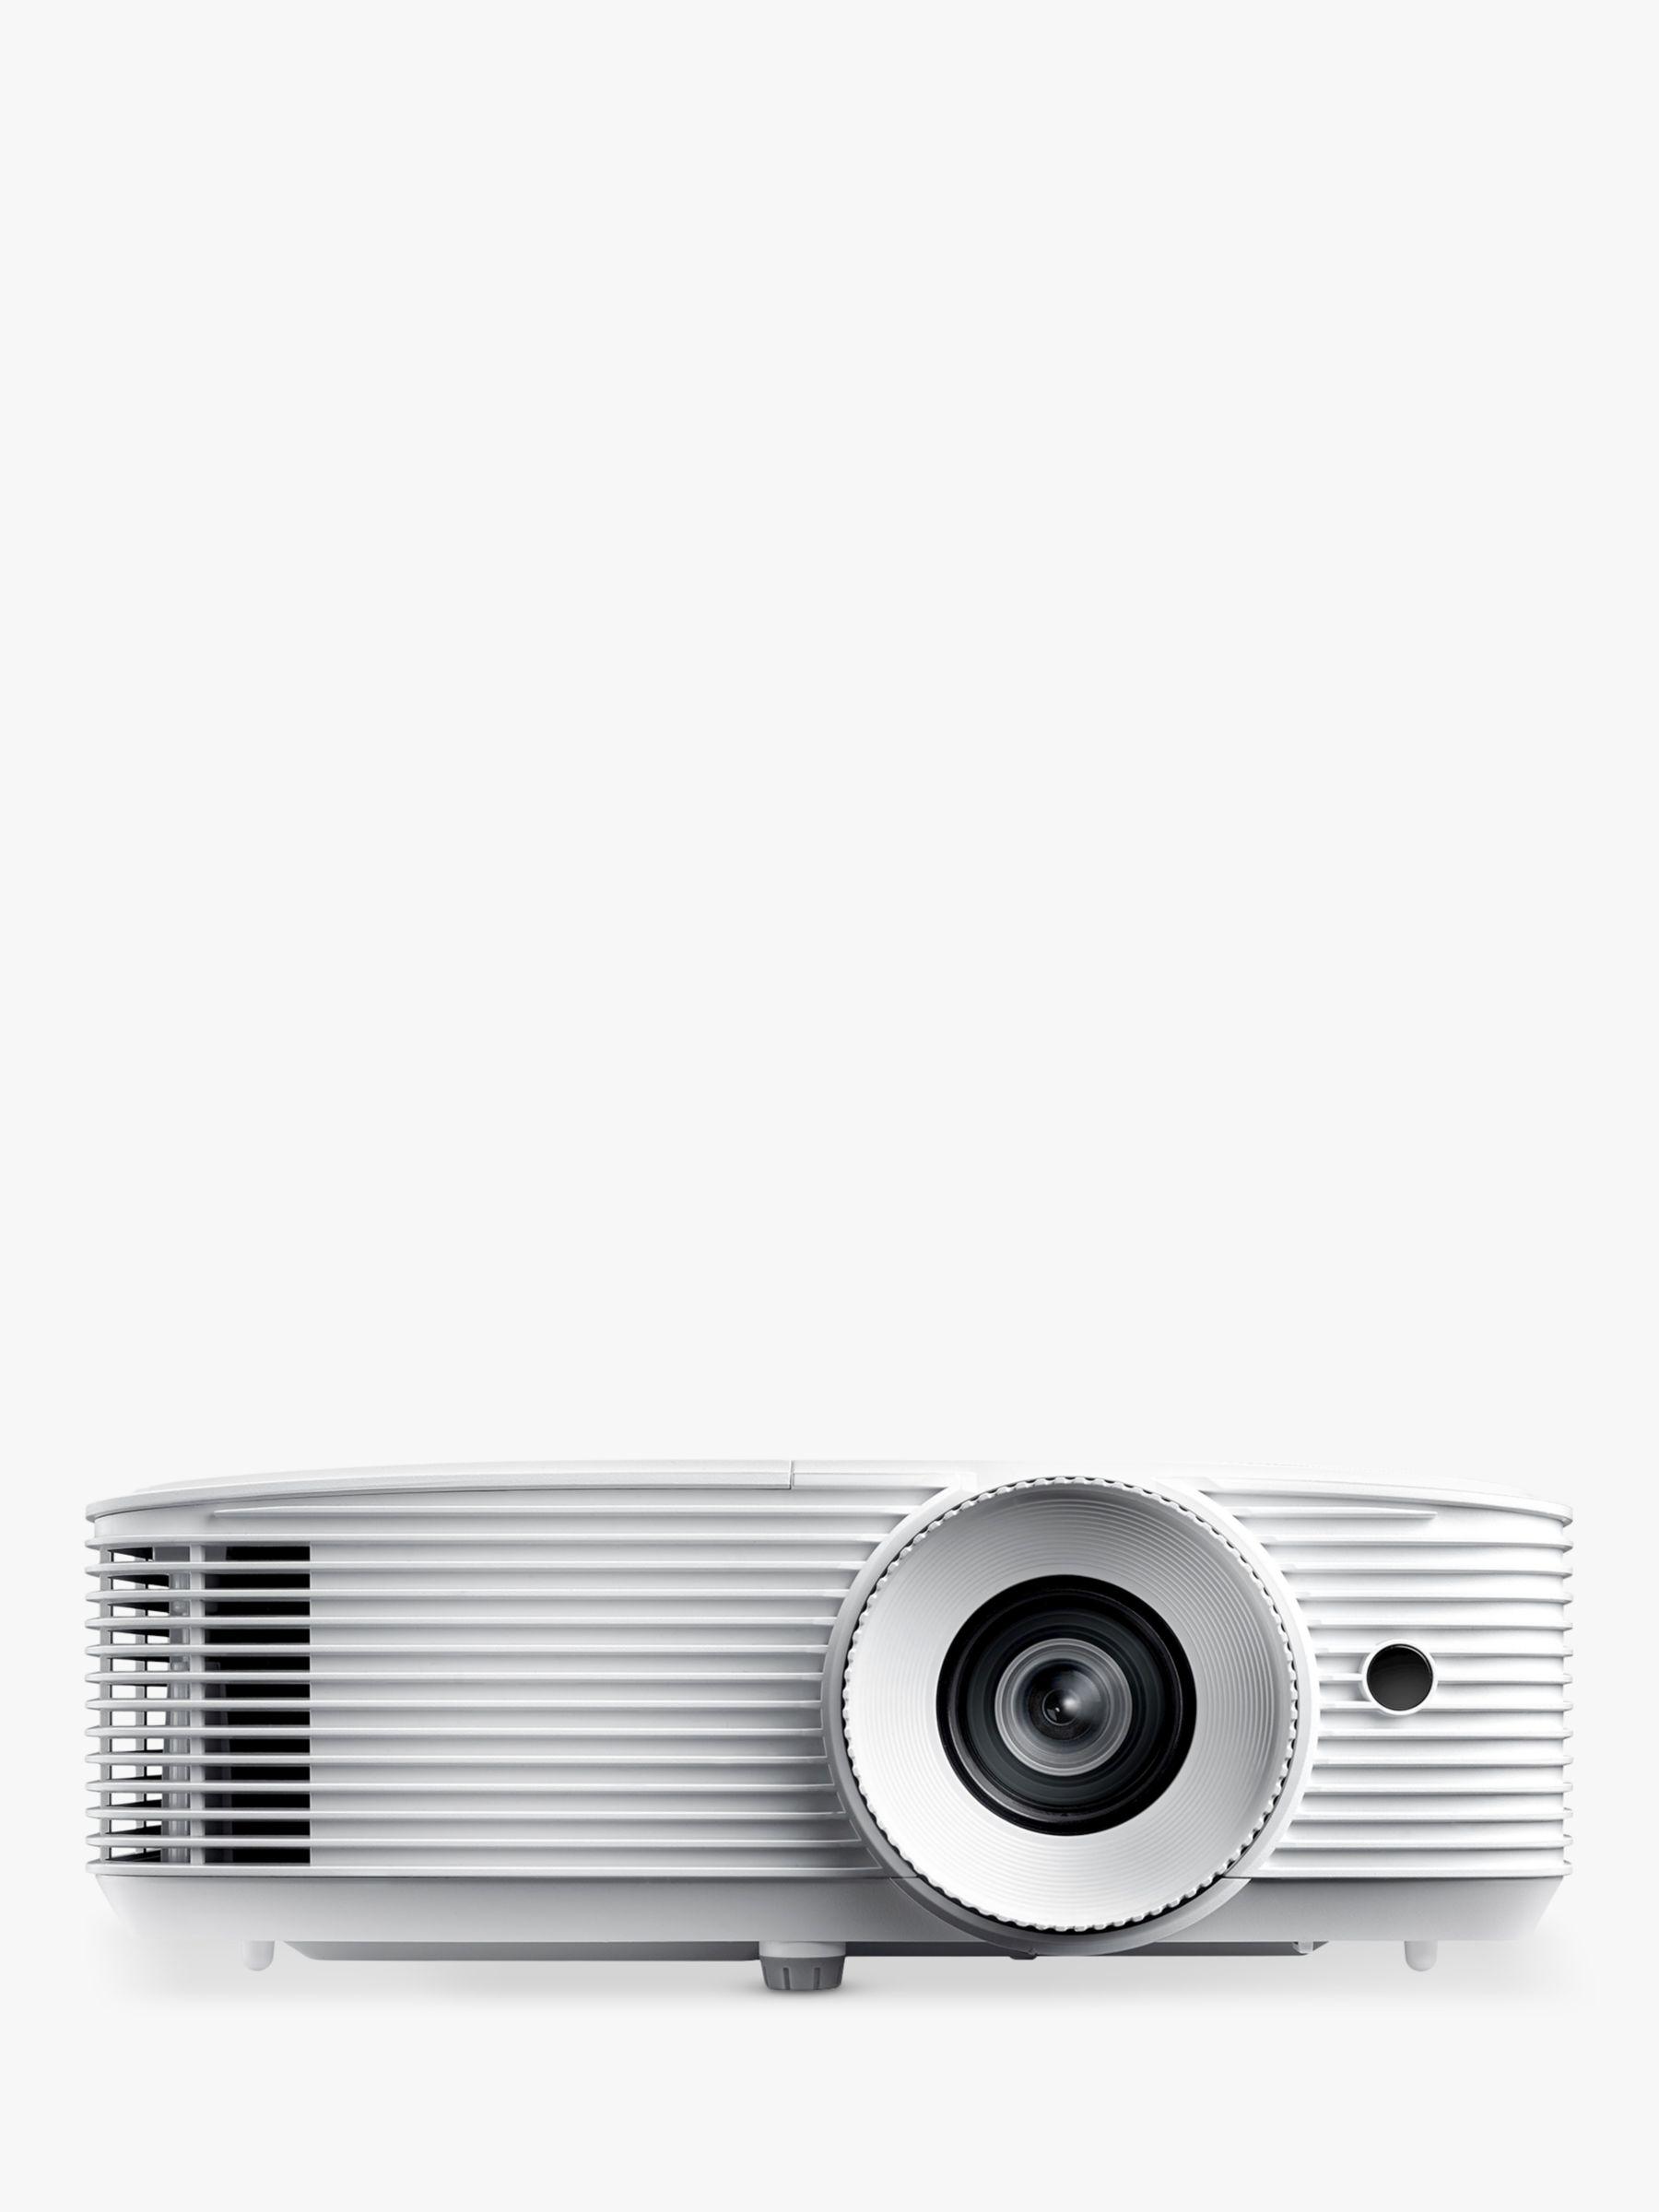 Optoma HD29He HDR 1080p Full HD 3D Projector, 3600 Lumens